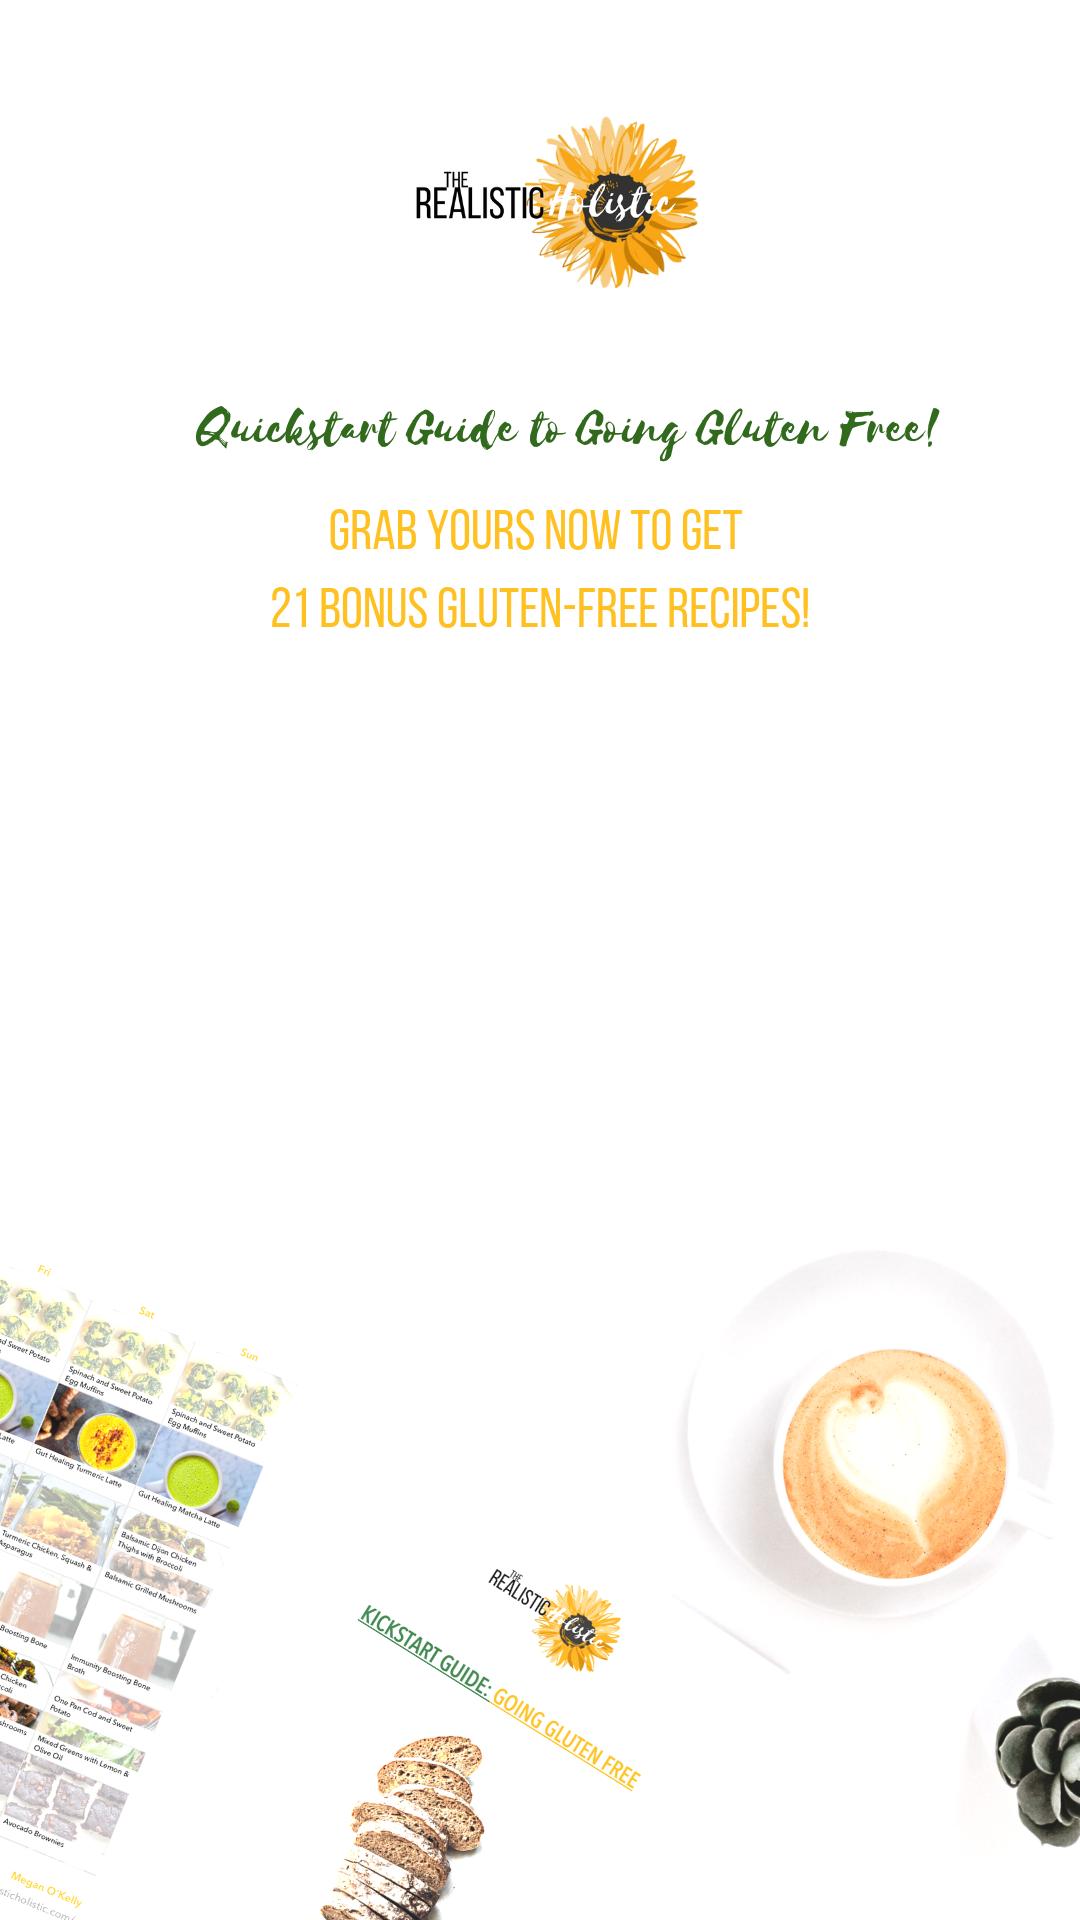 Quickstart Guide to Going Gluten-Free